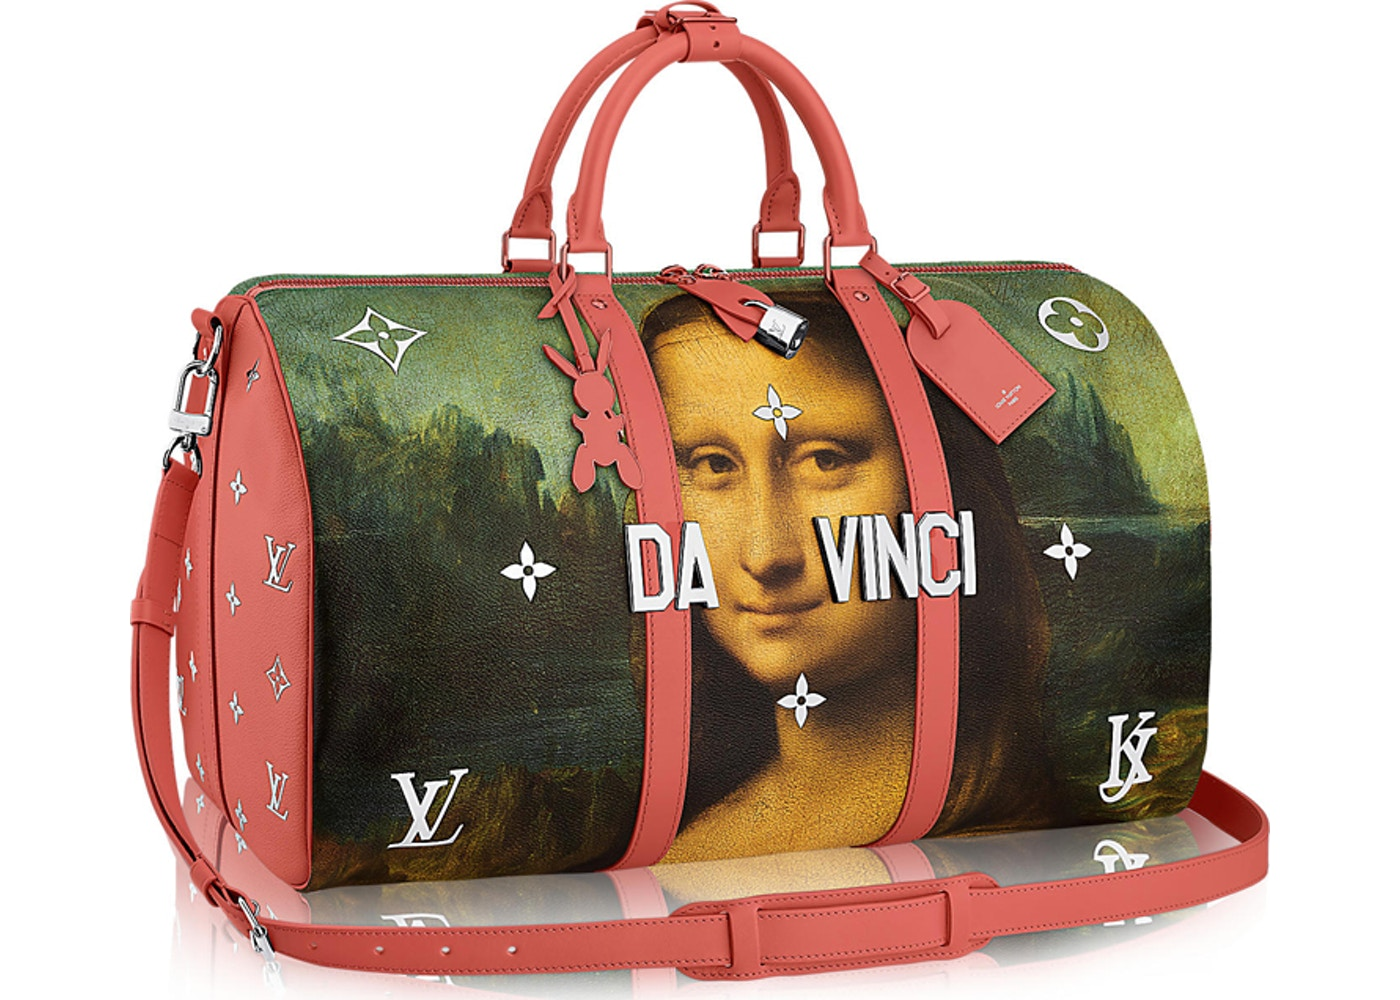 59ac5d9aea75 Louis Vuitton Keepall Leonardo da Vinci Masters Jeff Koons 50 Poppy ...